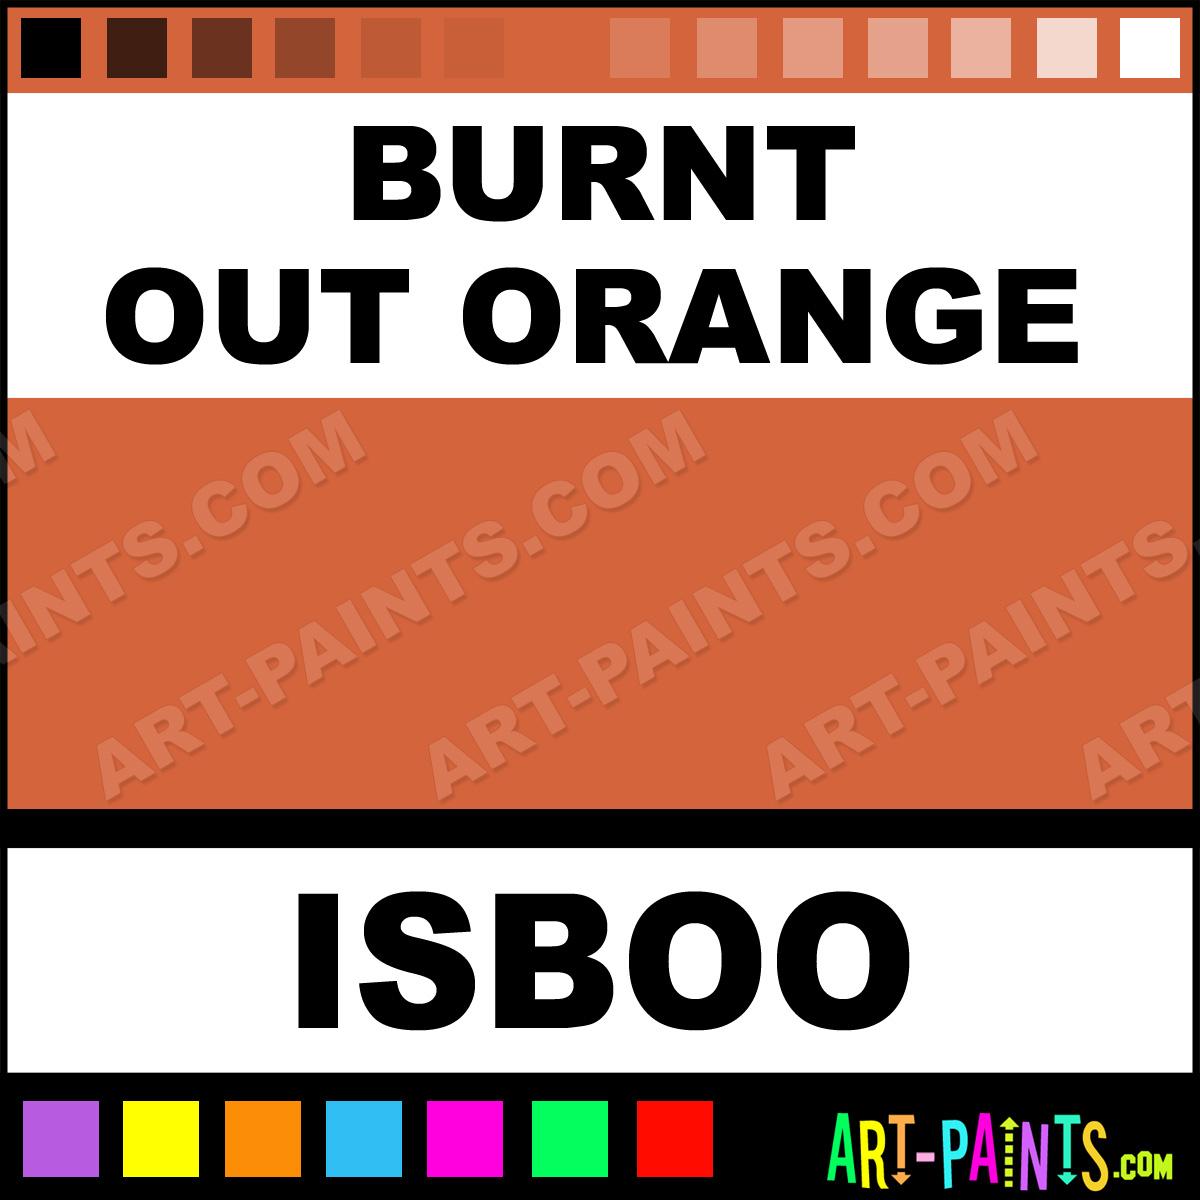 302 found - Burnt orange paint colors ...